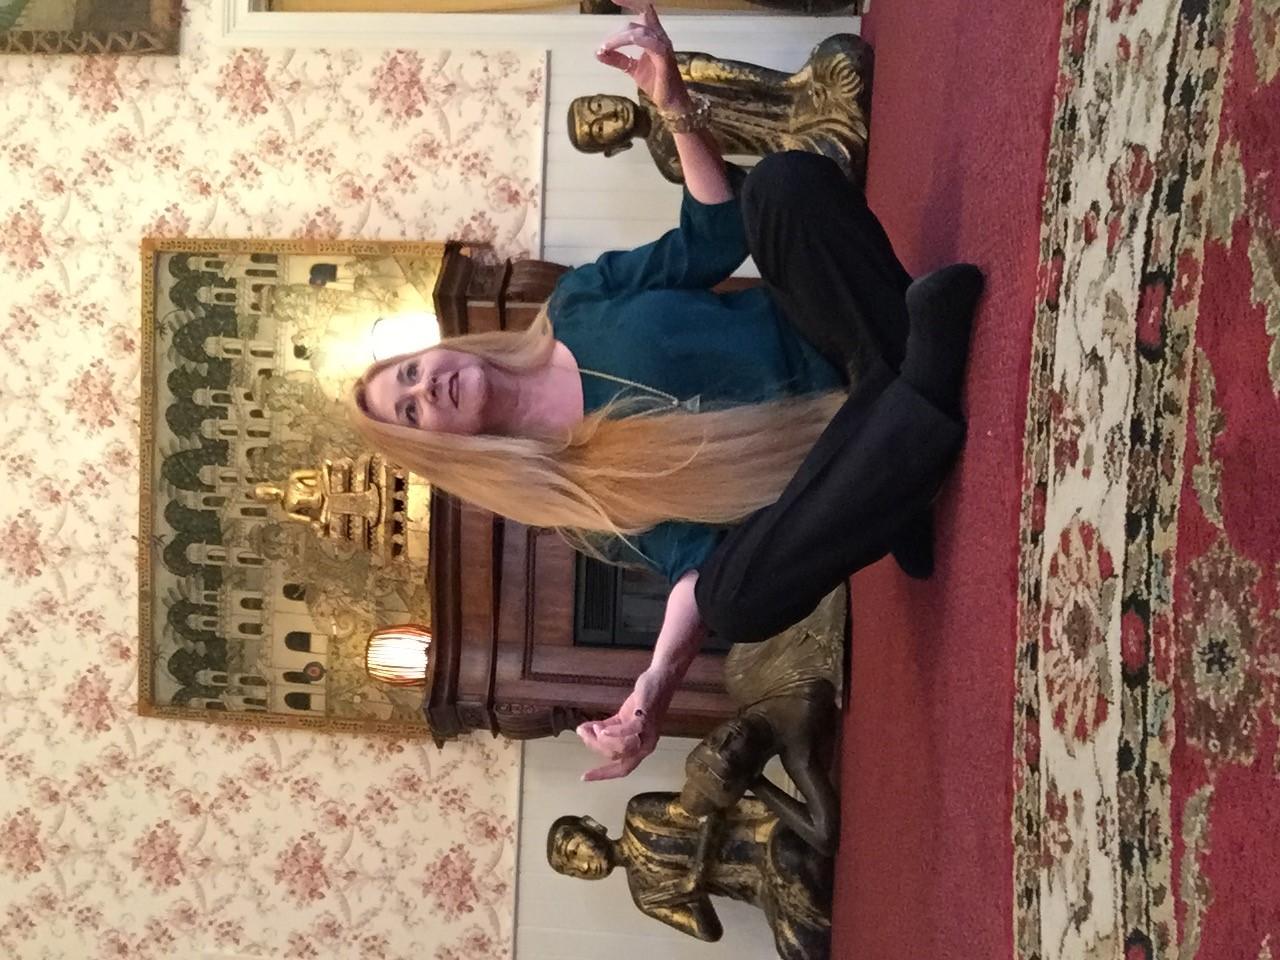 Vickie Gay psychic medium meditation prepares for VIP readings at the gallery in Nevada City, California.